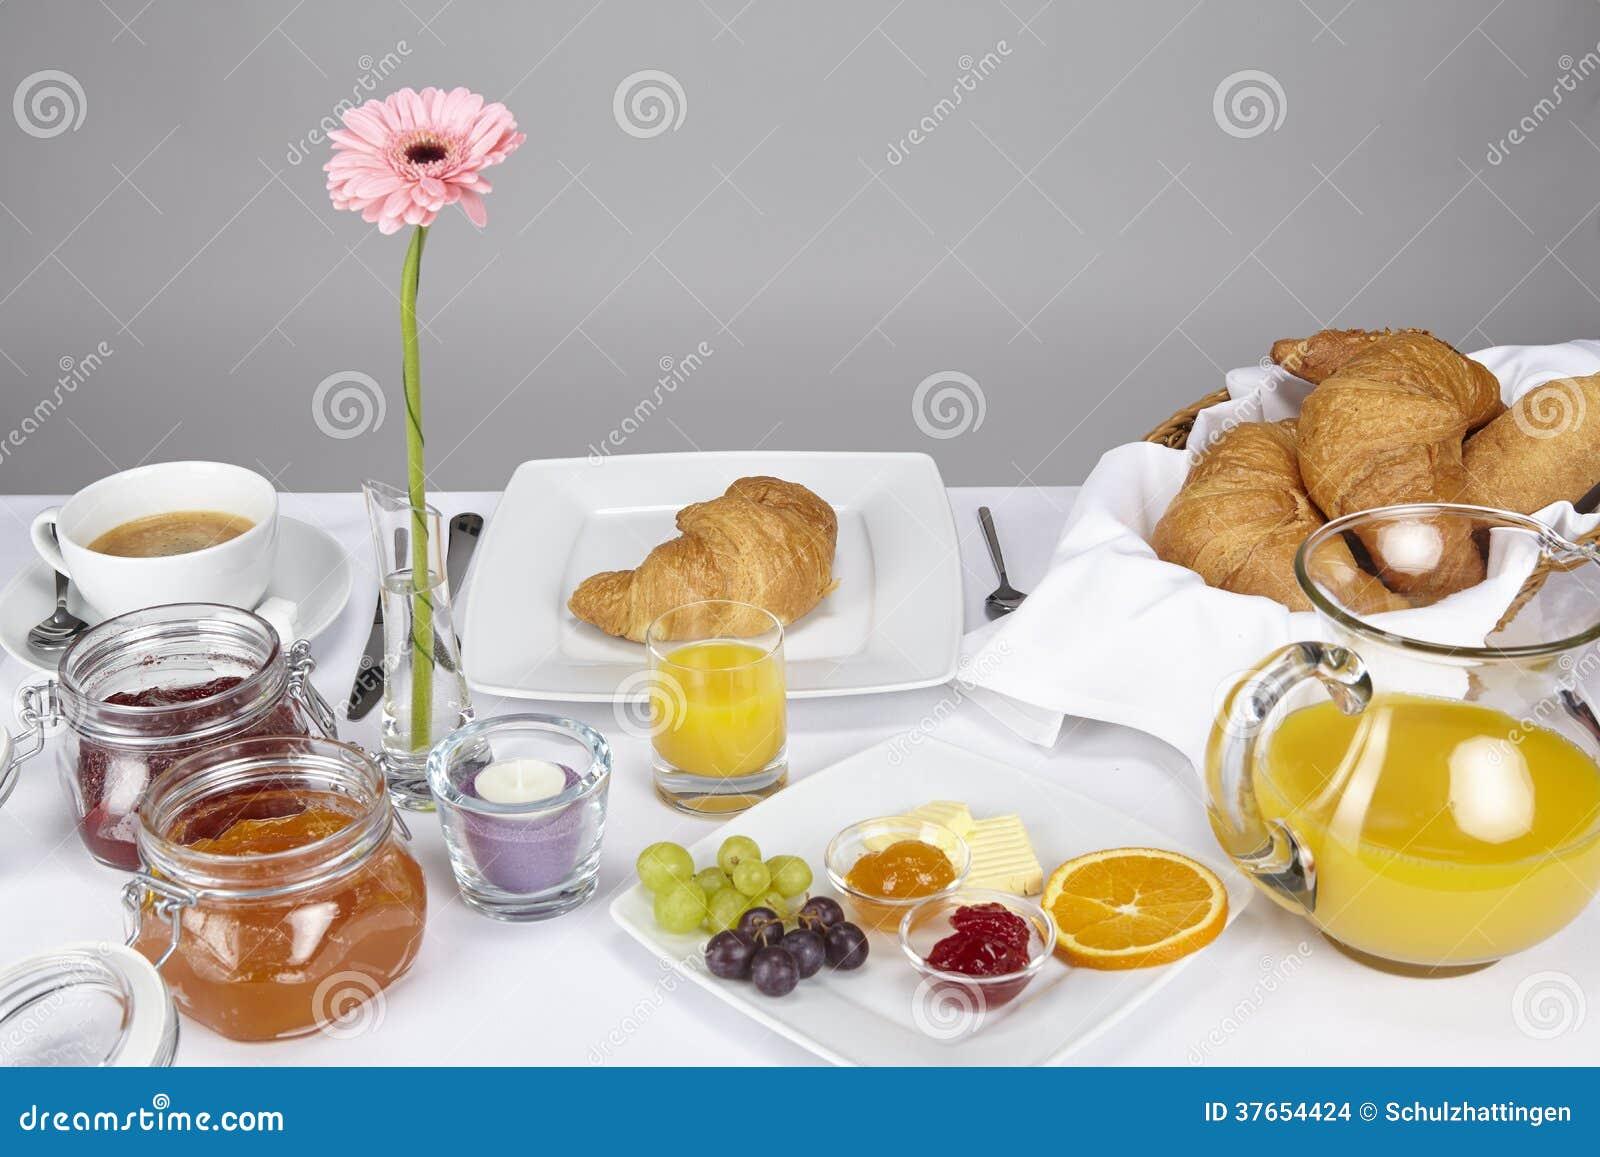 table de petit d jeuner images stock image 37654424. Black Bedroom Furniture Sets. Home Design Ideas